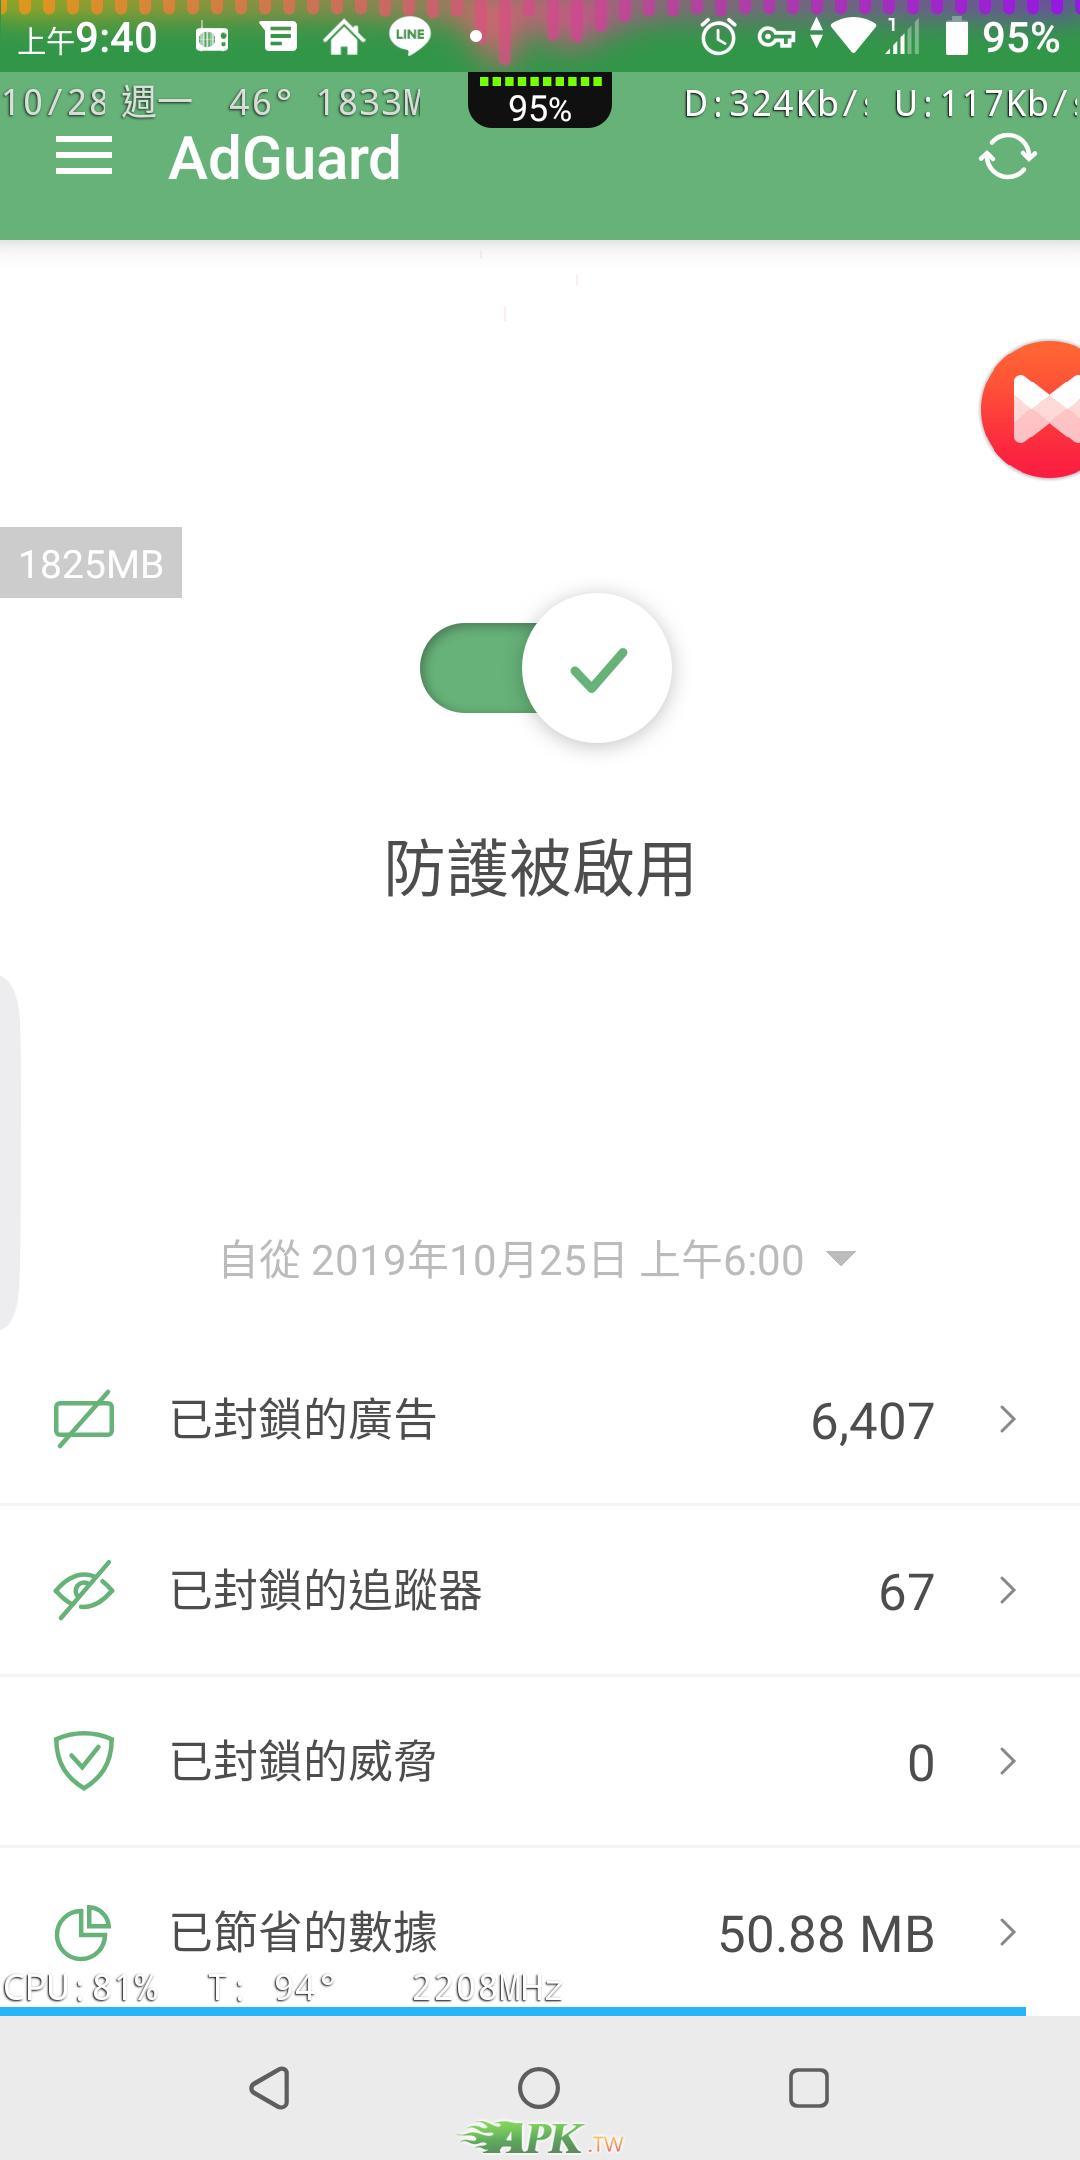 Screenshot_20191028-094020.png